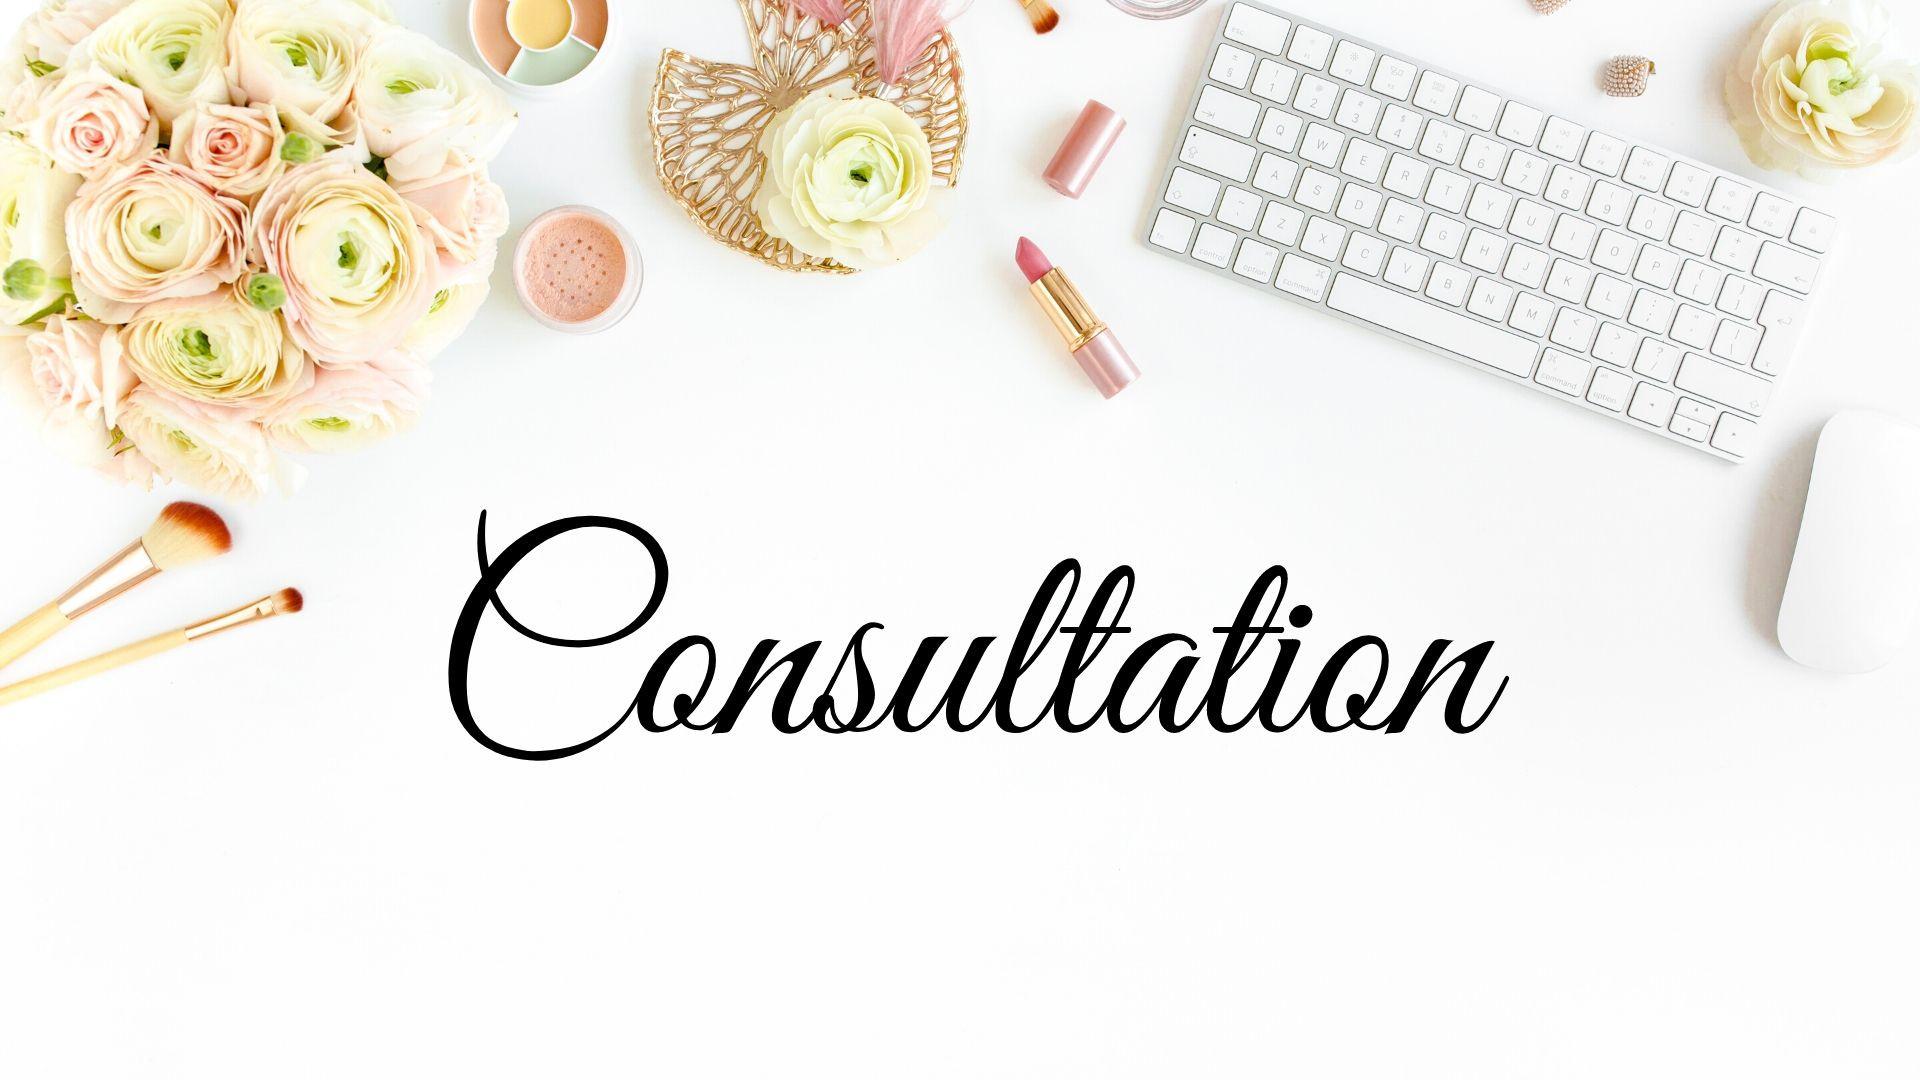 FREE Planning Consultation